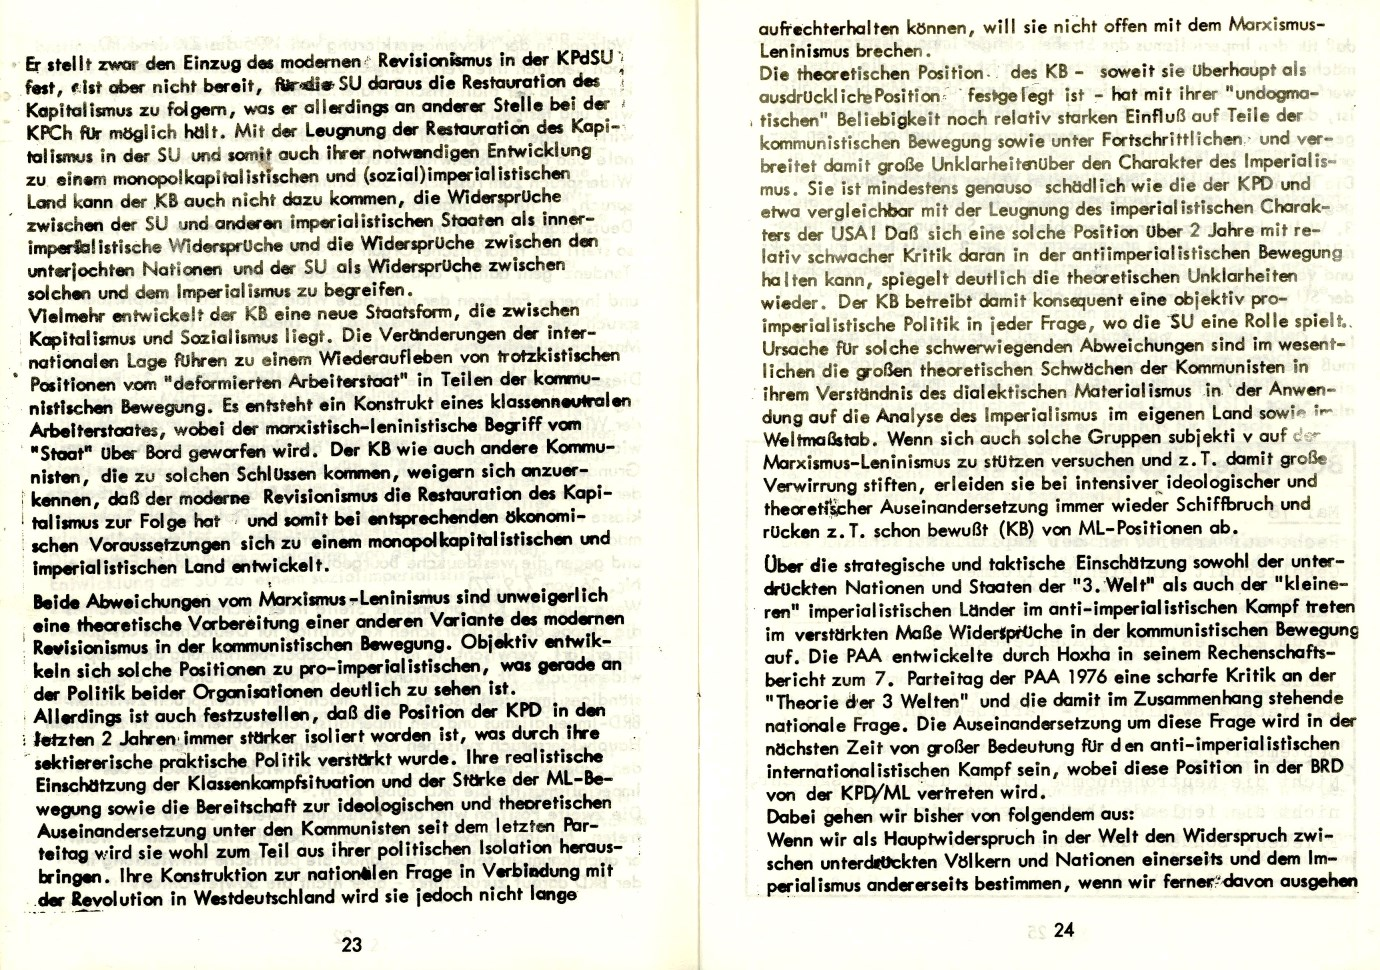 KGBE_1978_Resolutionen_13